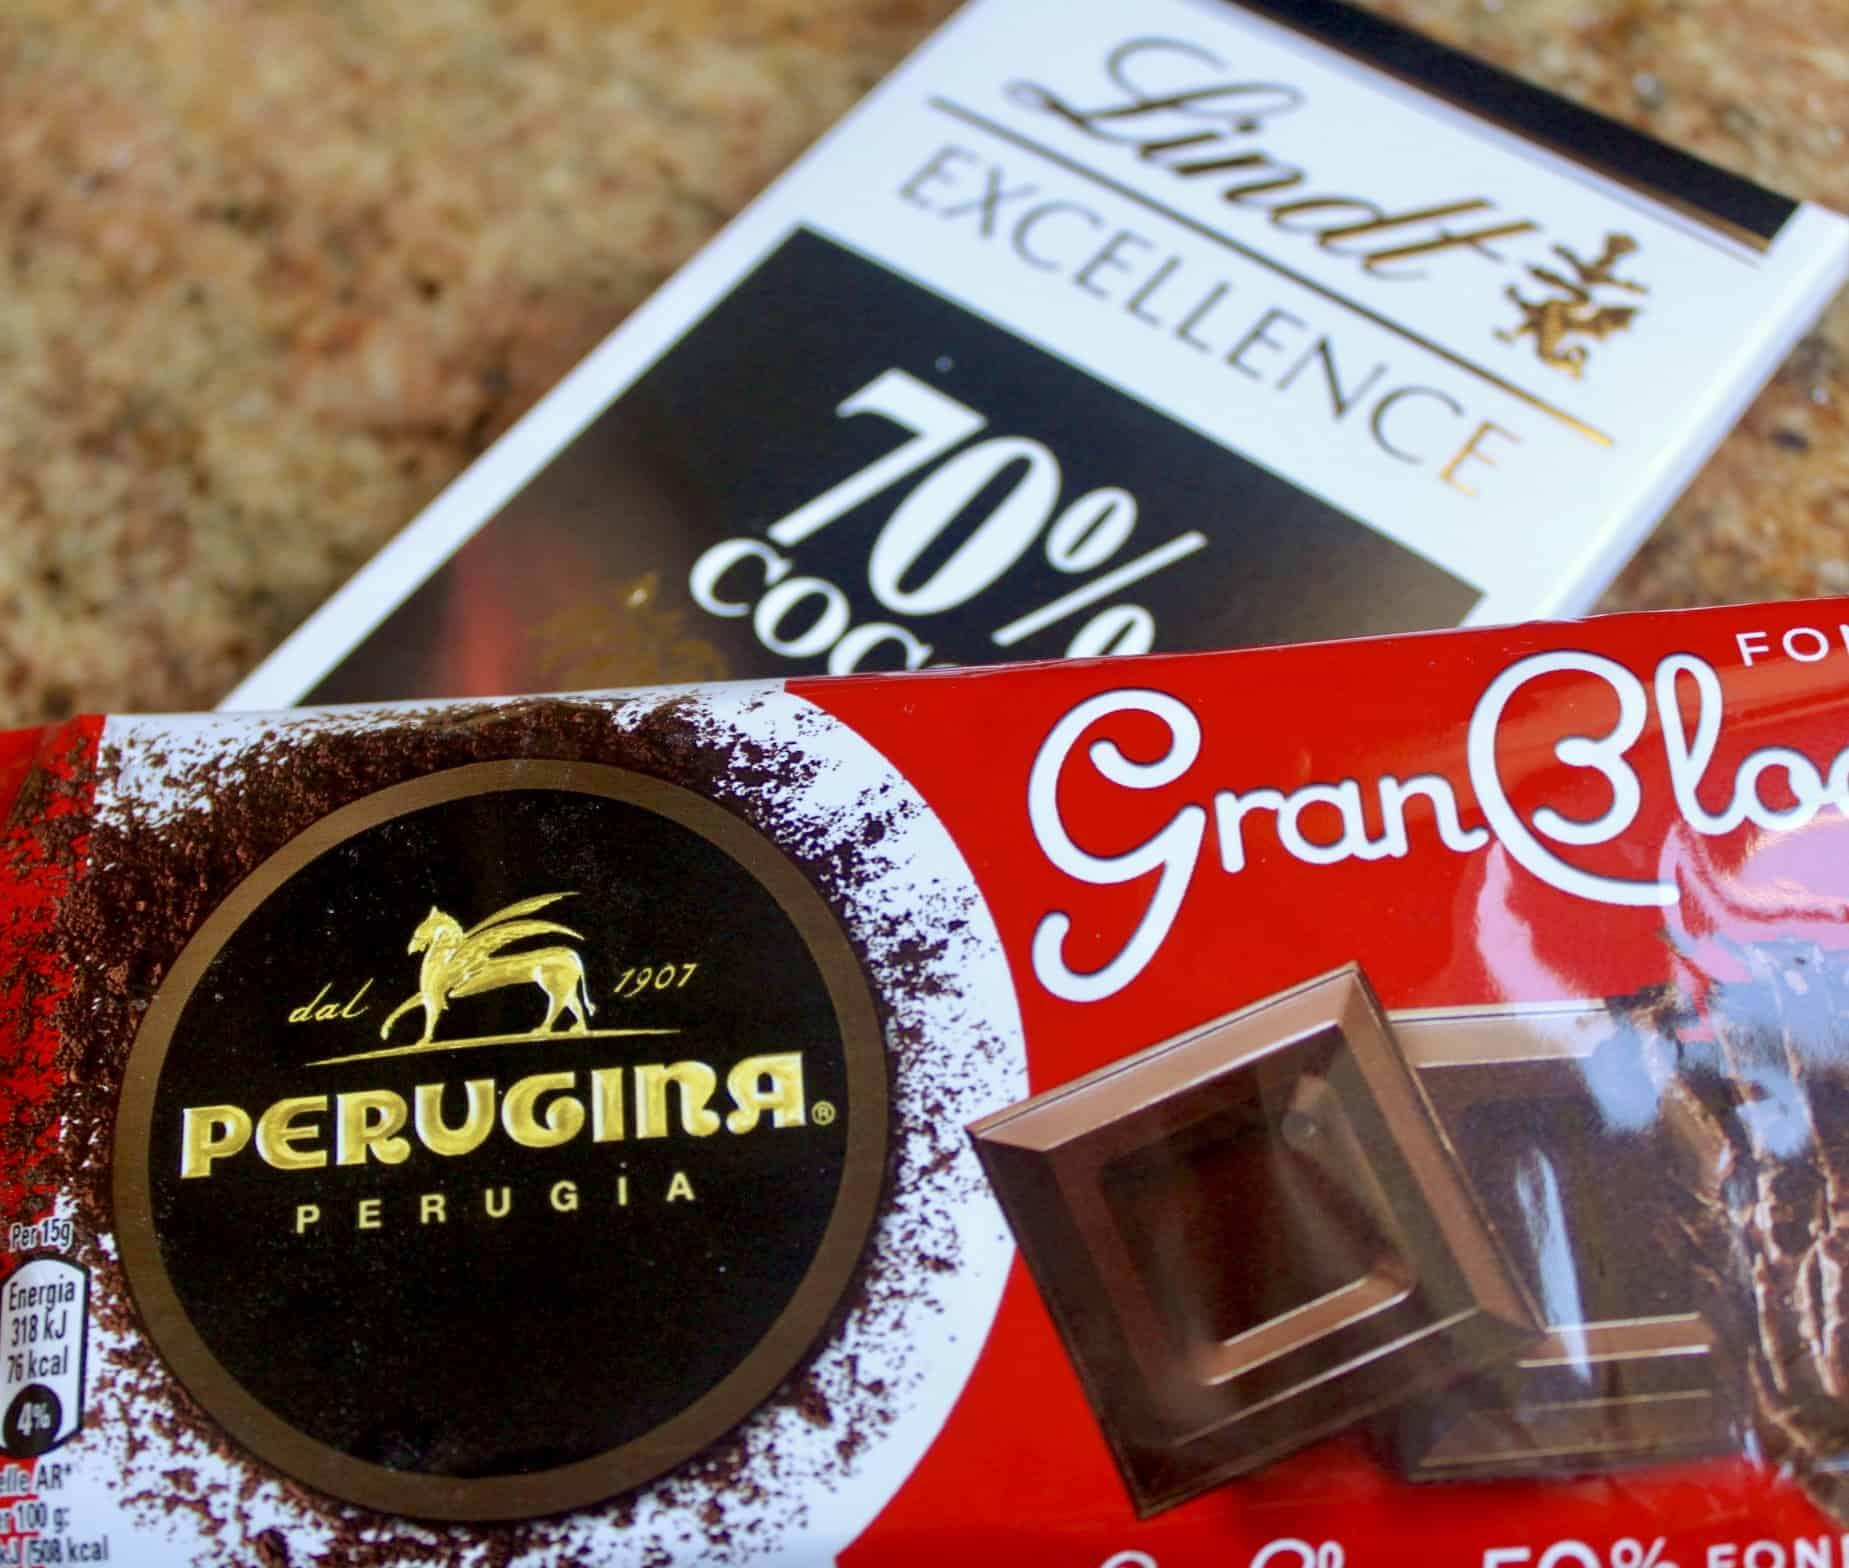 lindt and perugina chocolate bars